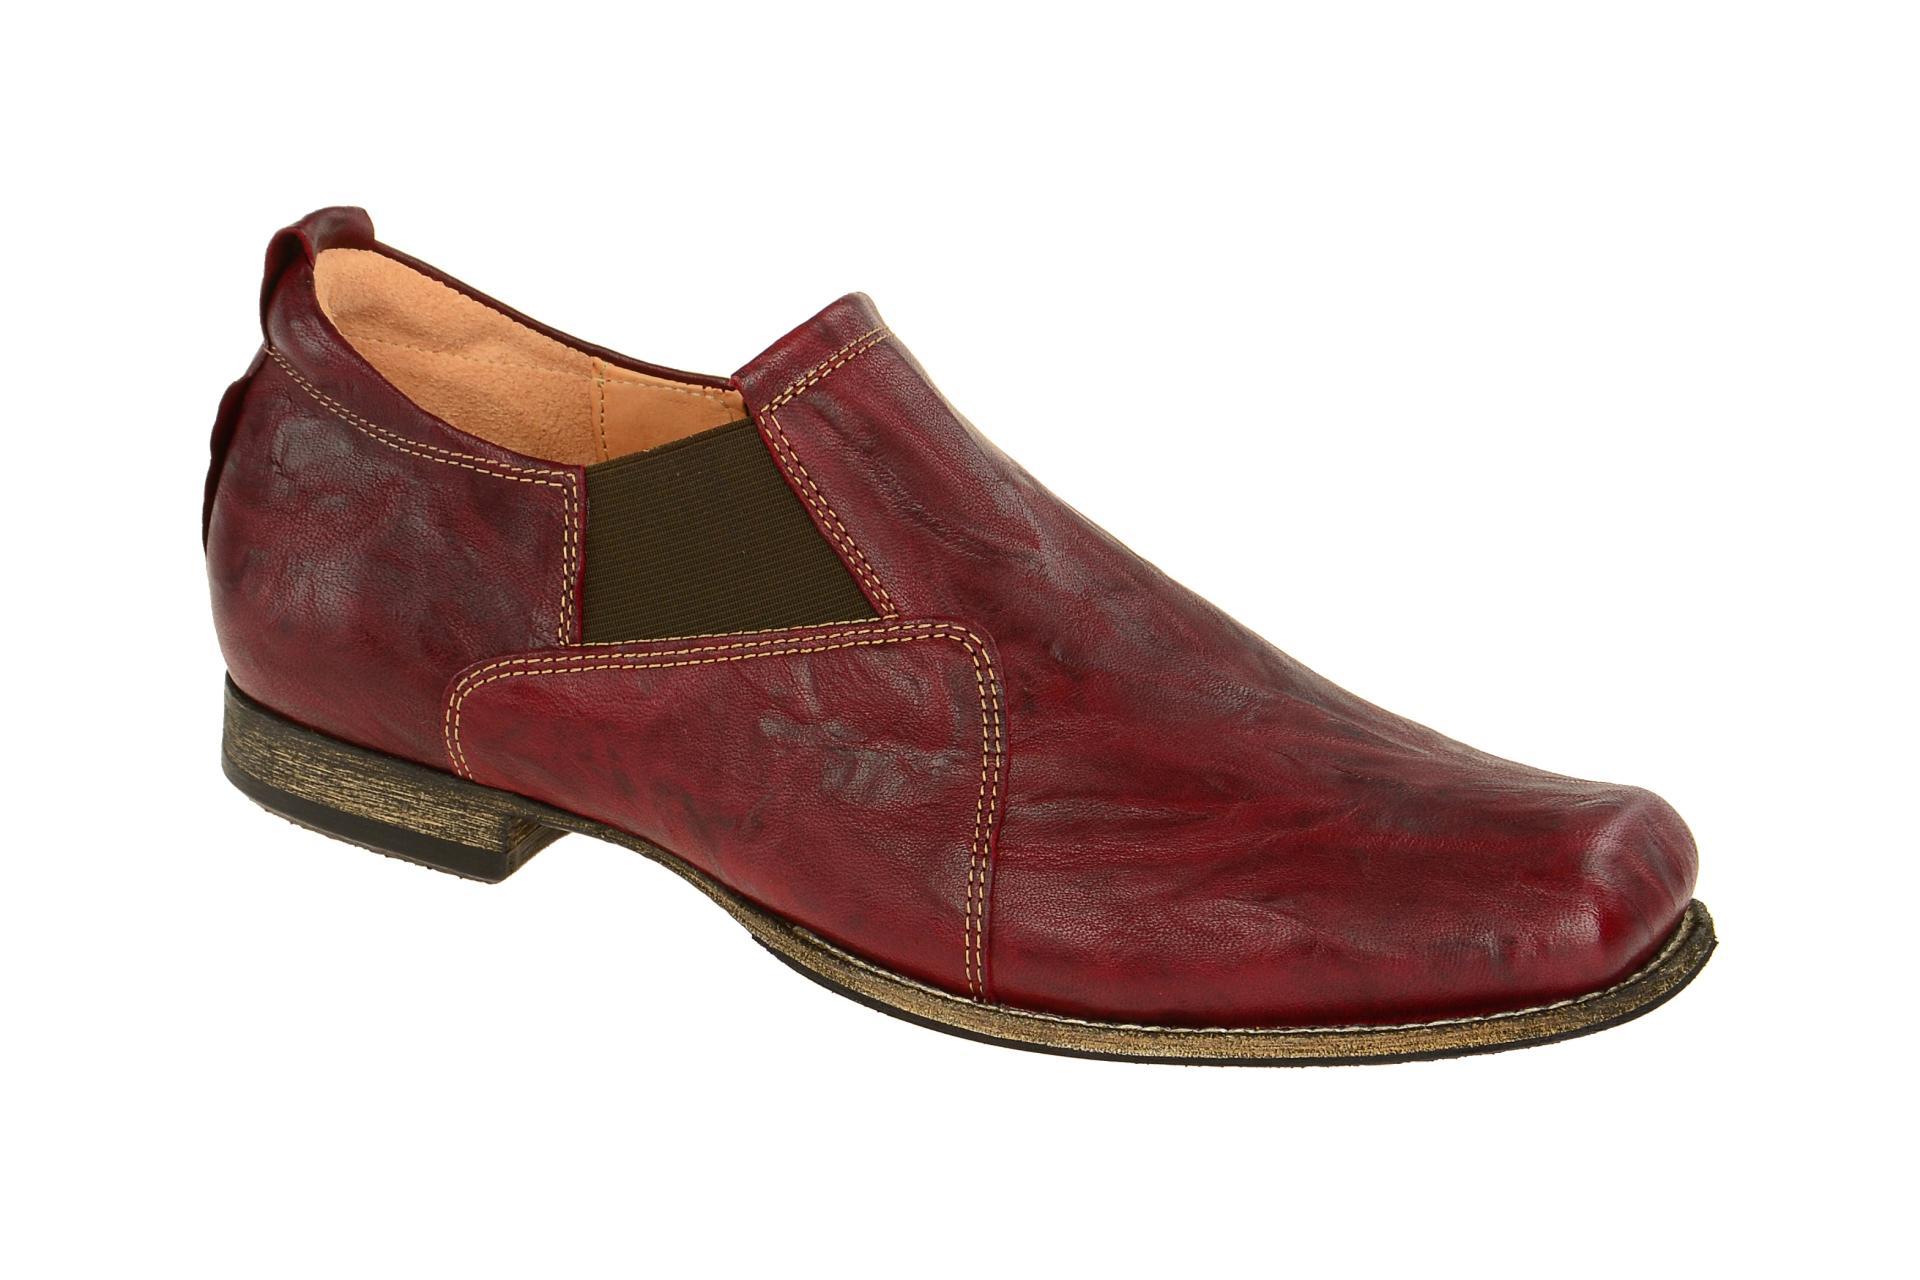 think schuhe guru rot herrenschuhe elegante slipper 2 82693 72 neu ebay. Black Bedroom Furniture Sets. Home Design Ideas